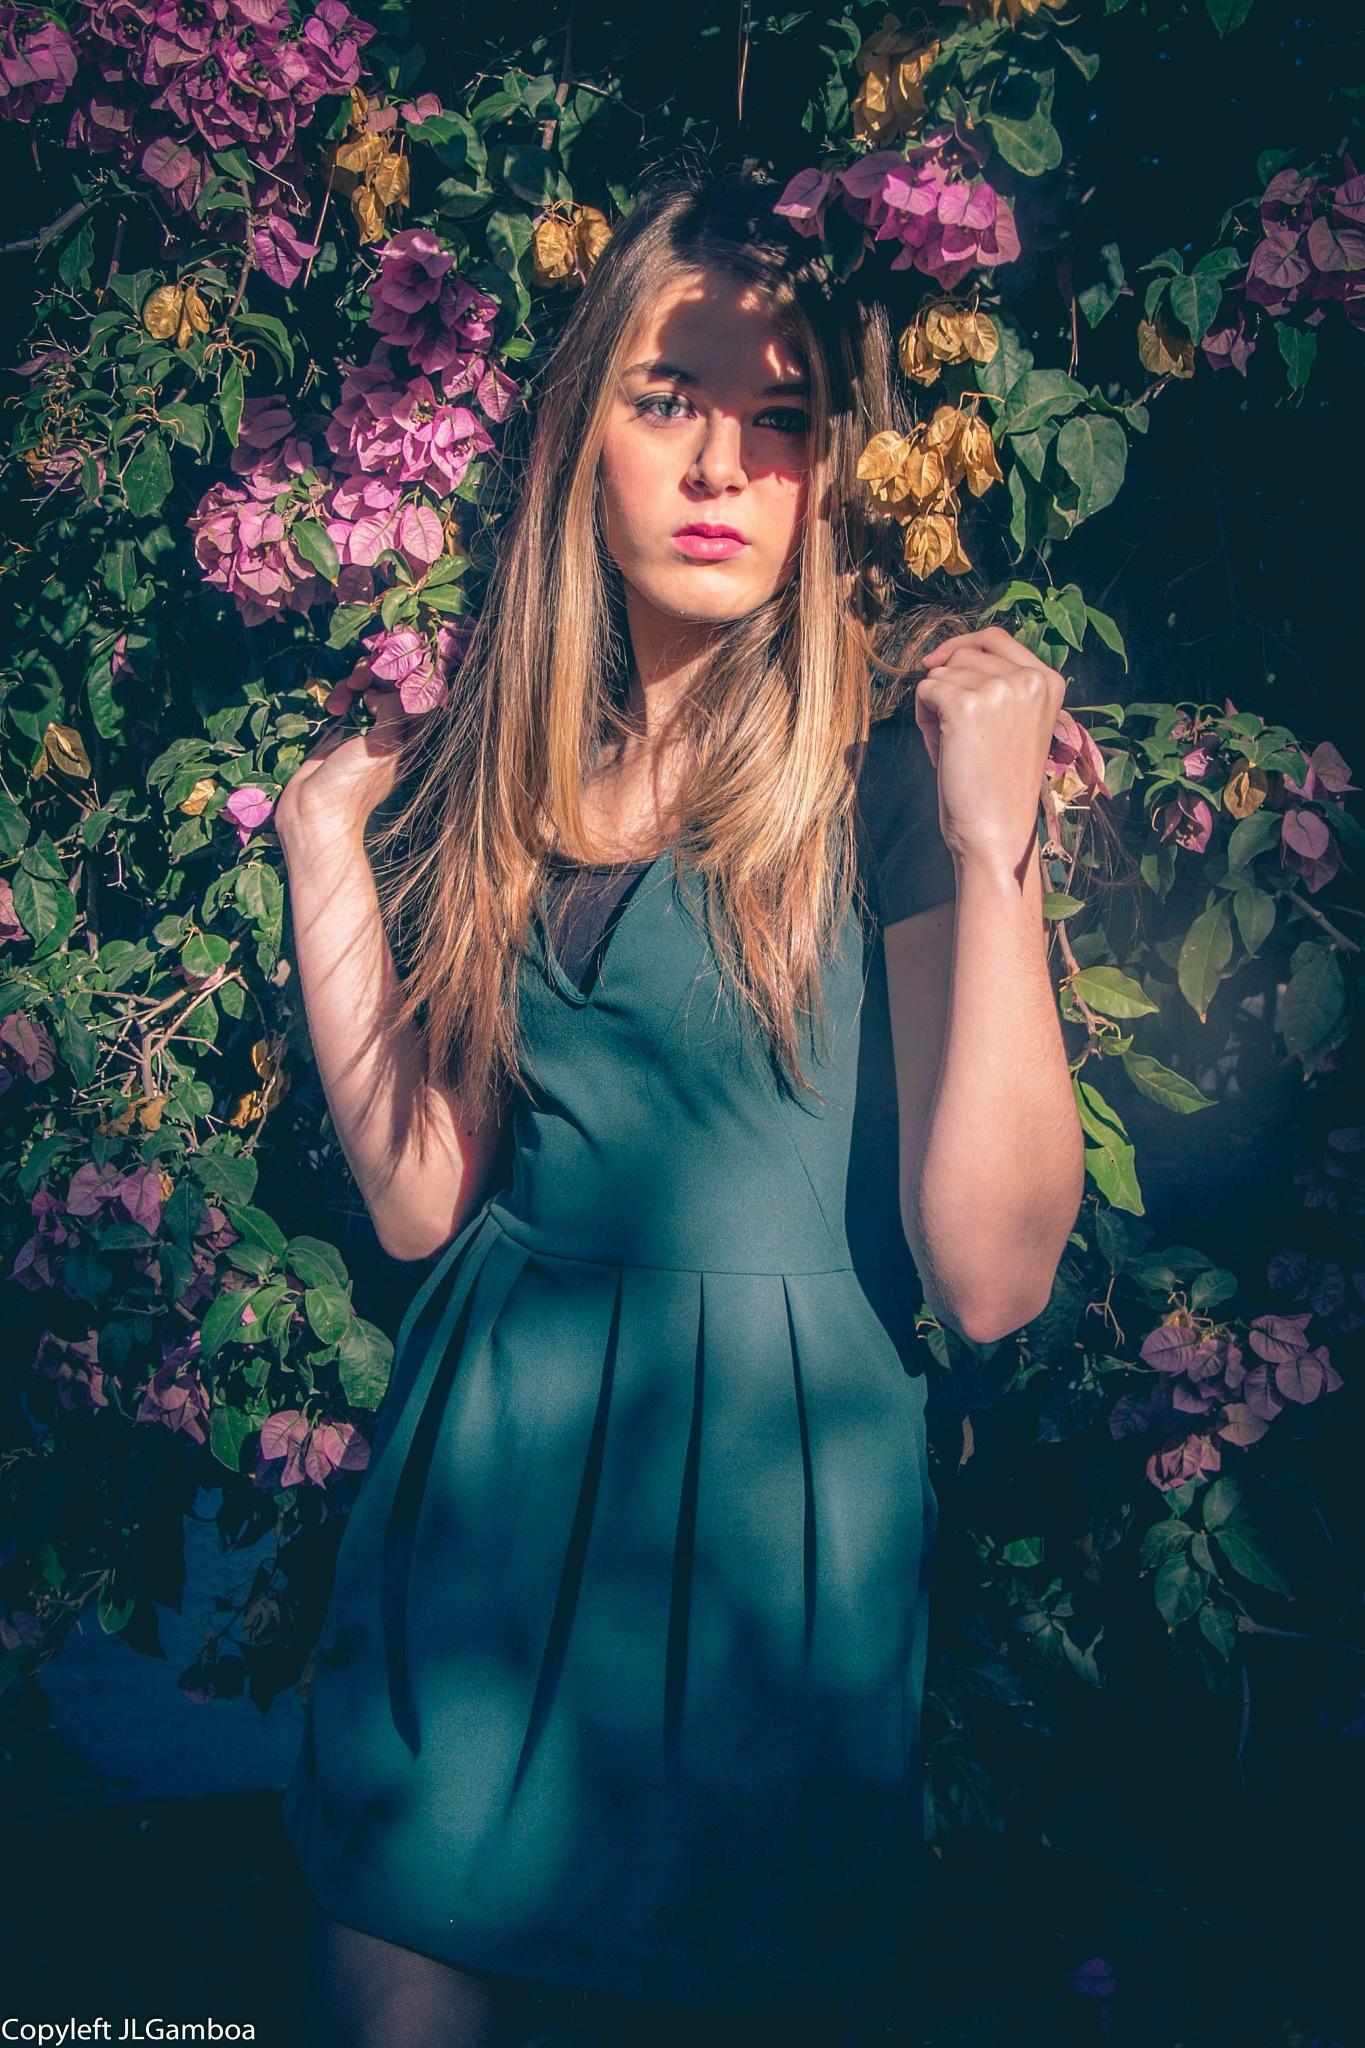 Laura Guerrero B by Jose Luis Gamboa Urgeles